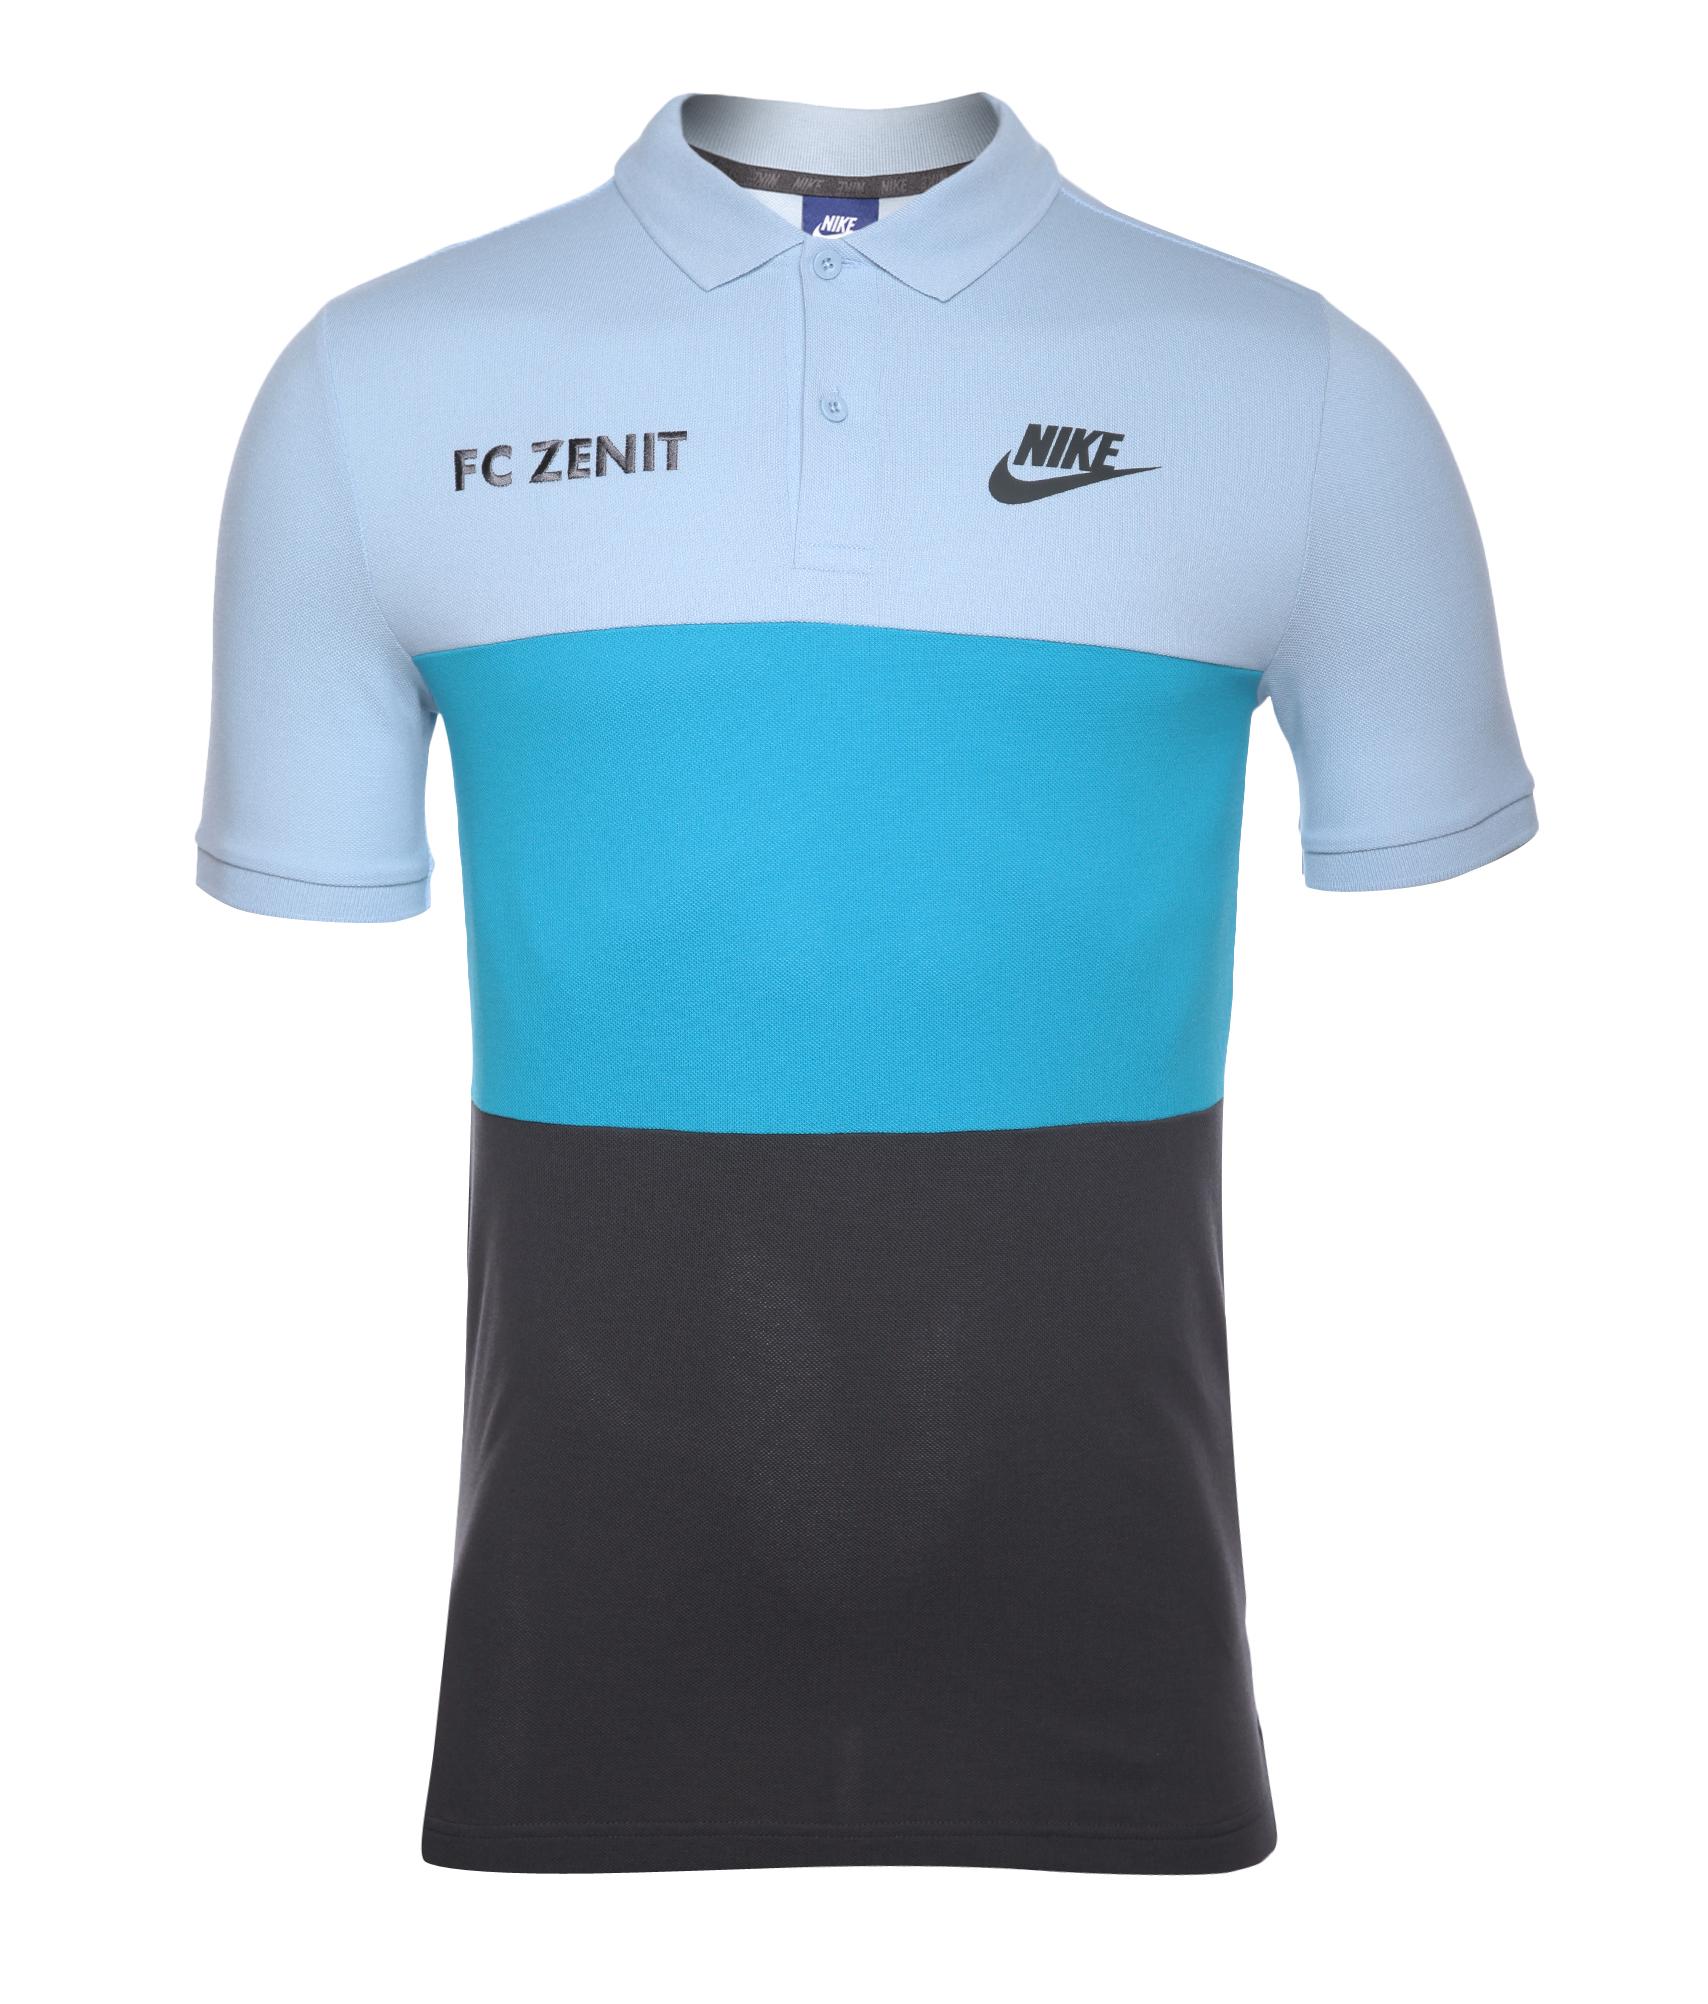 Поло Nike, Цвет-Полоска, Размер-XL поло nike цвет голубой размер m